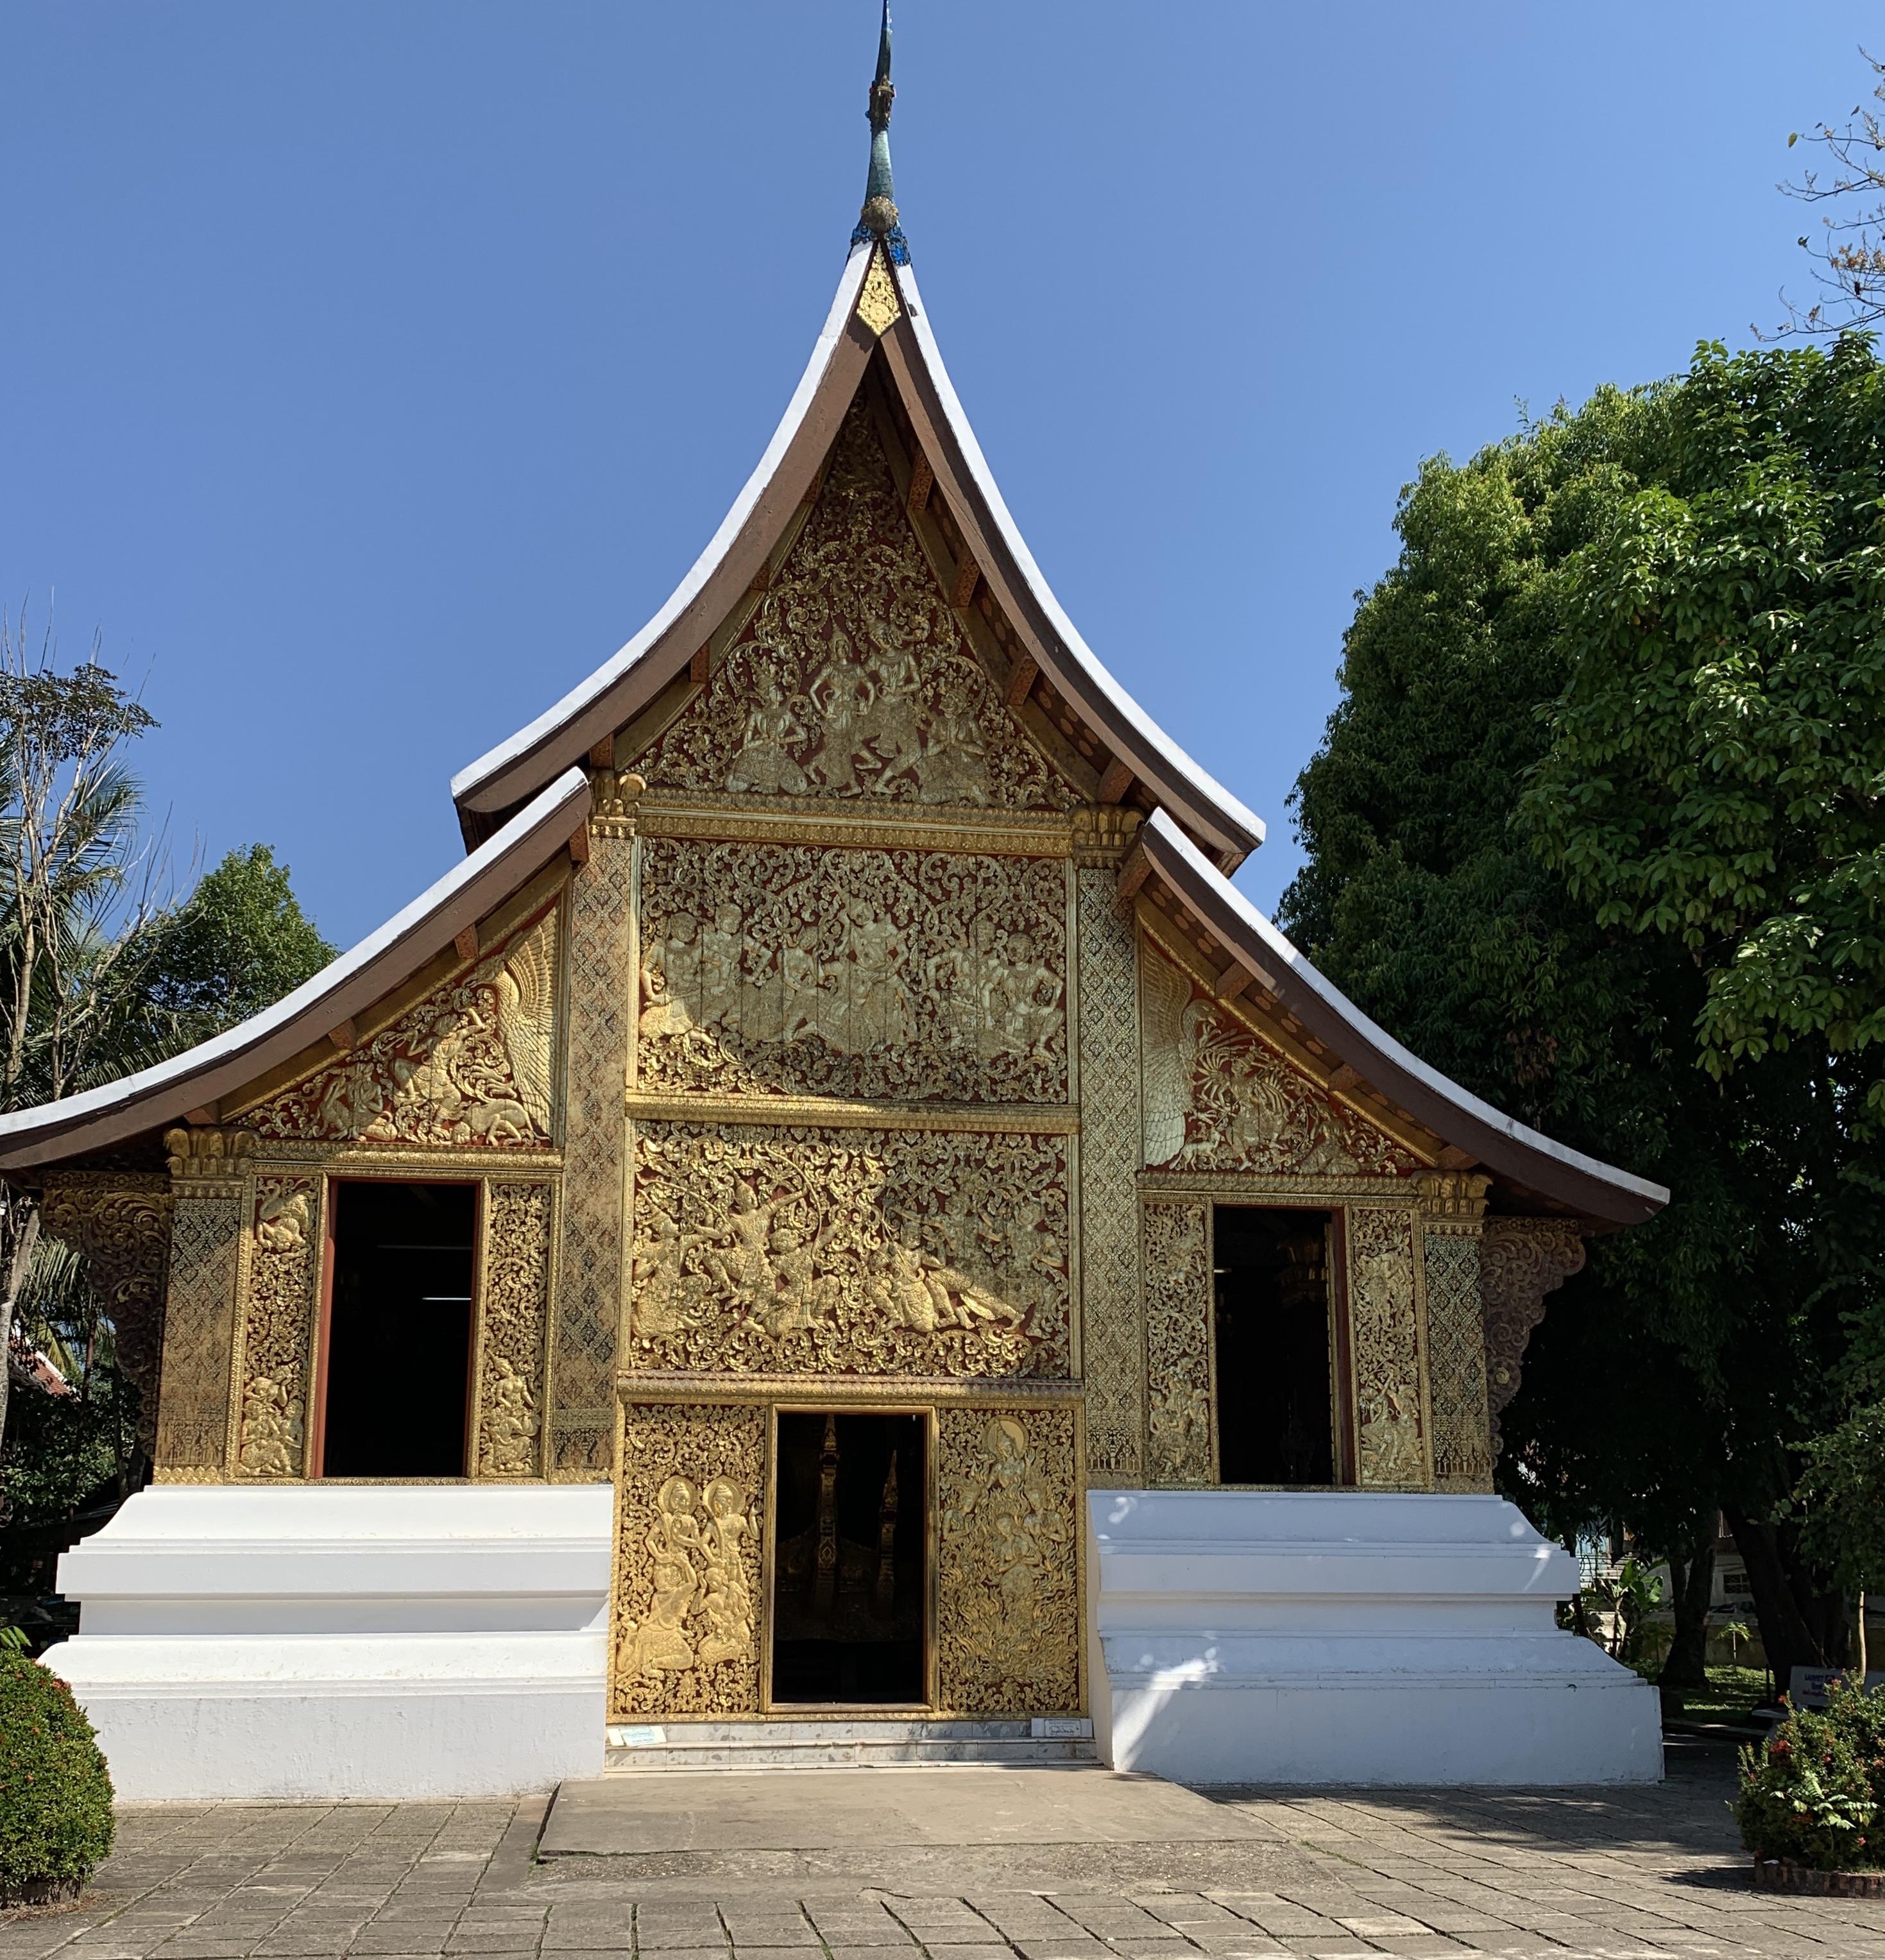 De temples en temples à Luang Prabang.